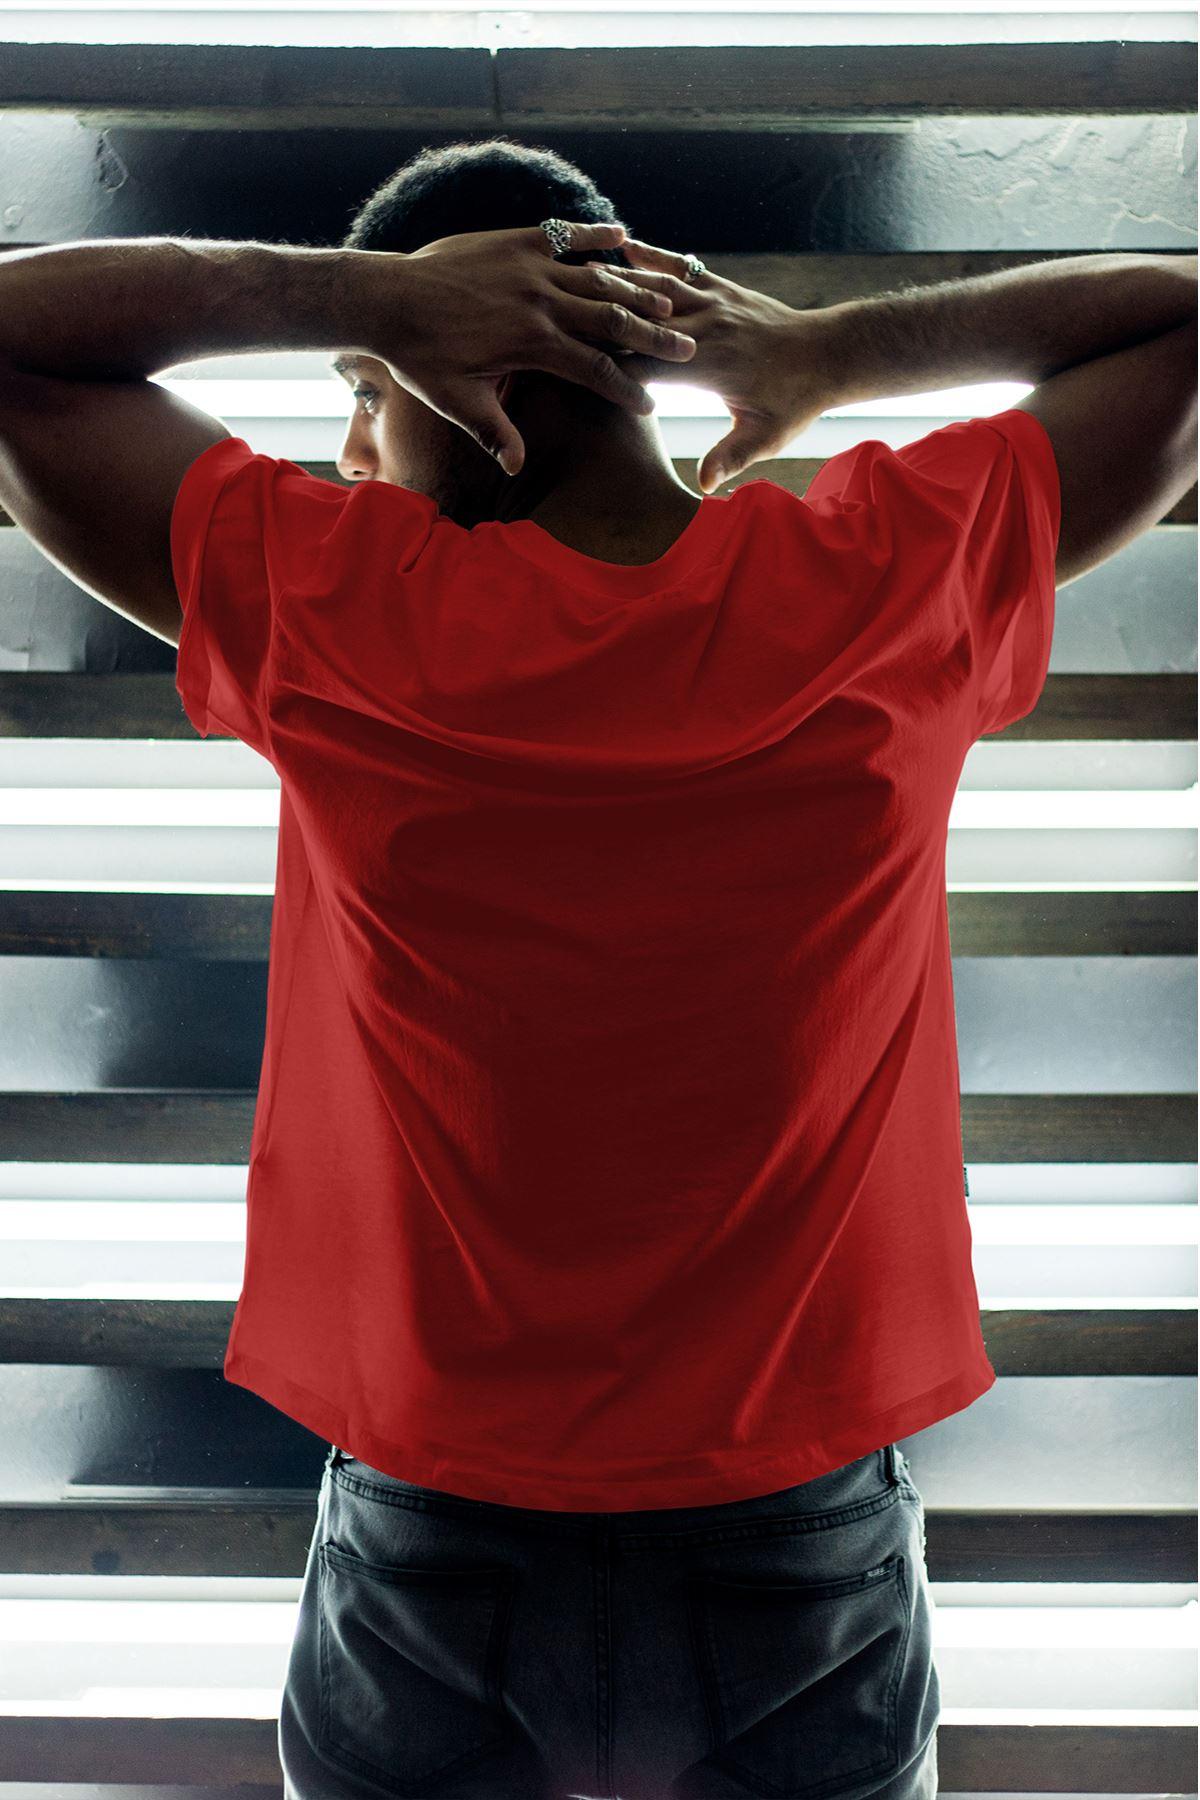 Boston Celtics 24 Kırmızı Erkek Oversize Tshirt - Tişört